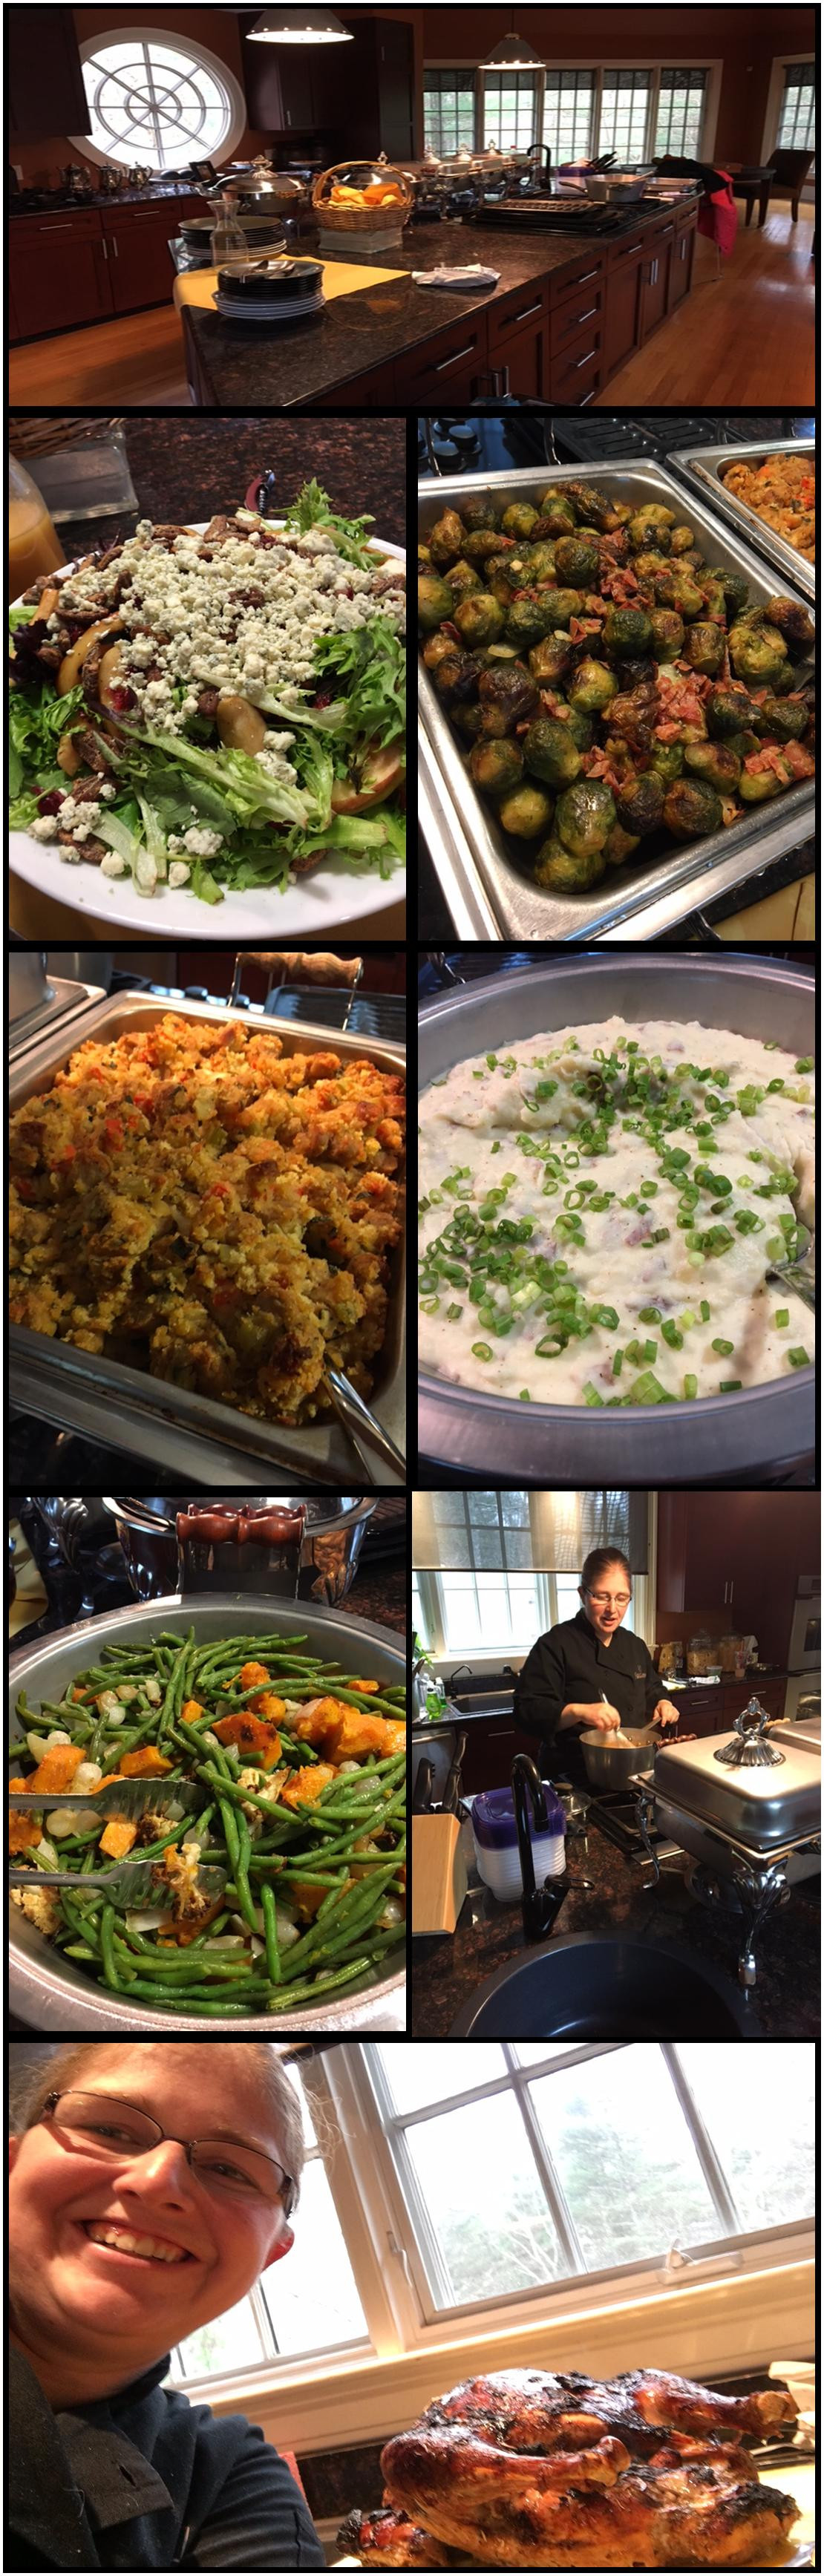 Catered Thanksgiving Dinner  Catering Thanksgiving Dinner North Smithfield RI 2016